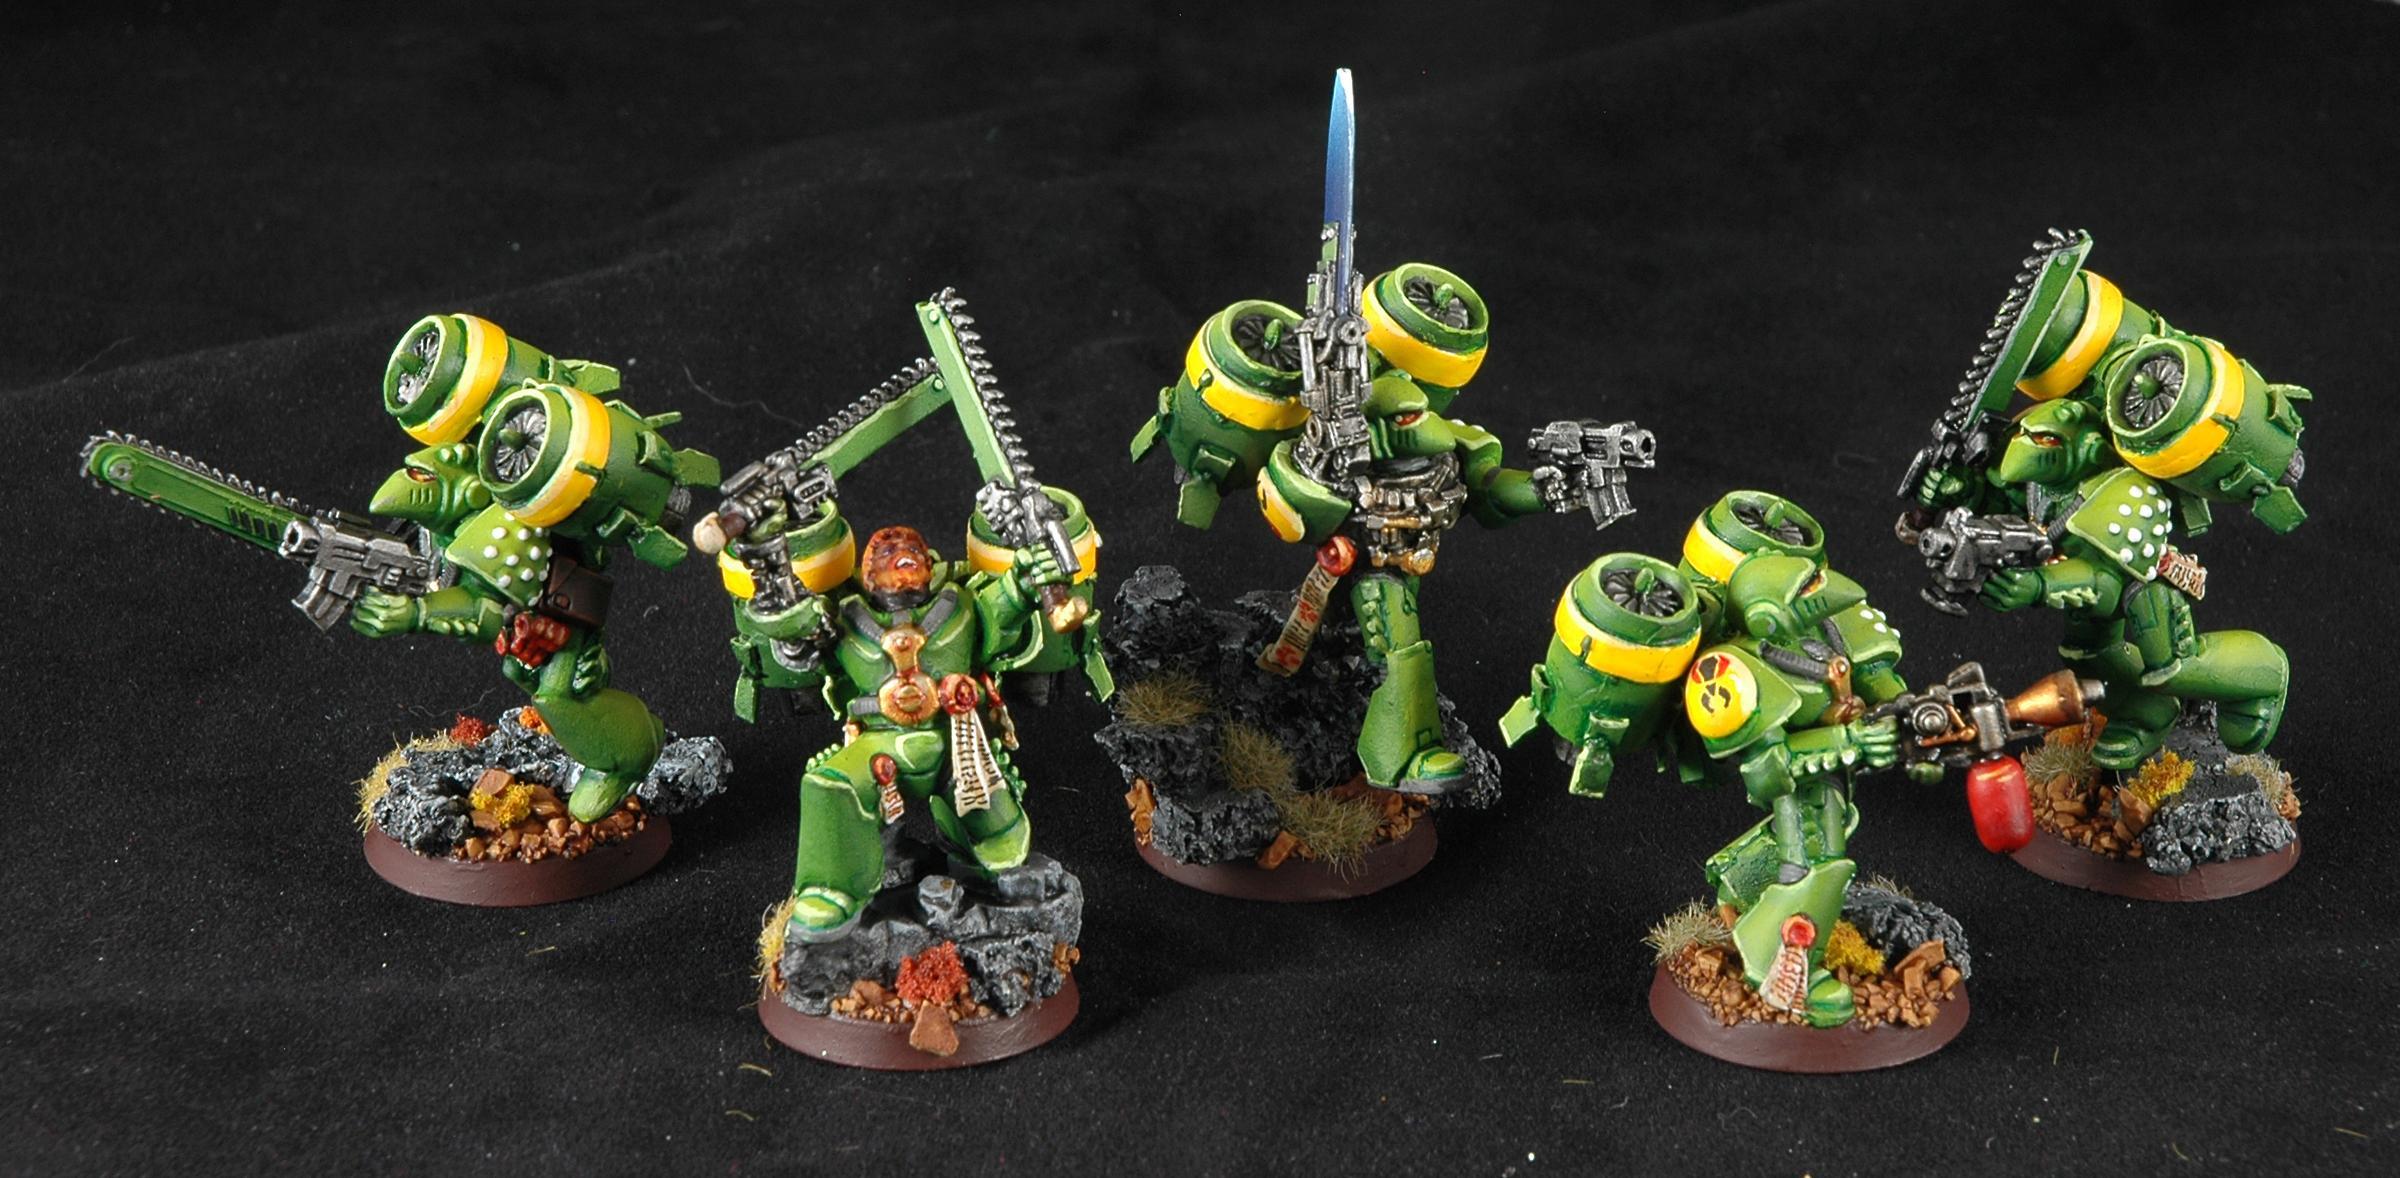 Assault Squad, Mantis Warriors, Space Marines, Warhammer 40,000